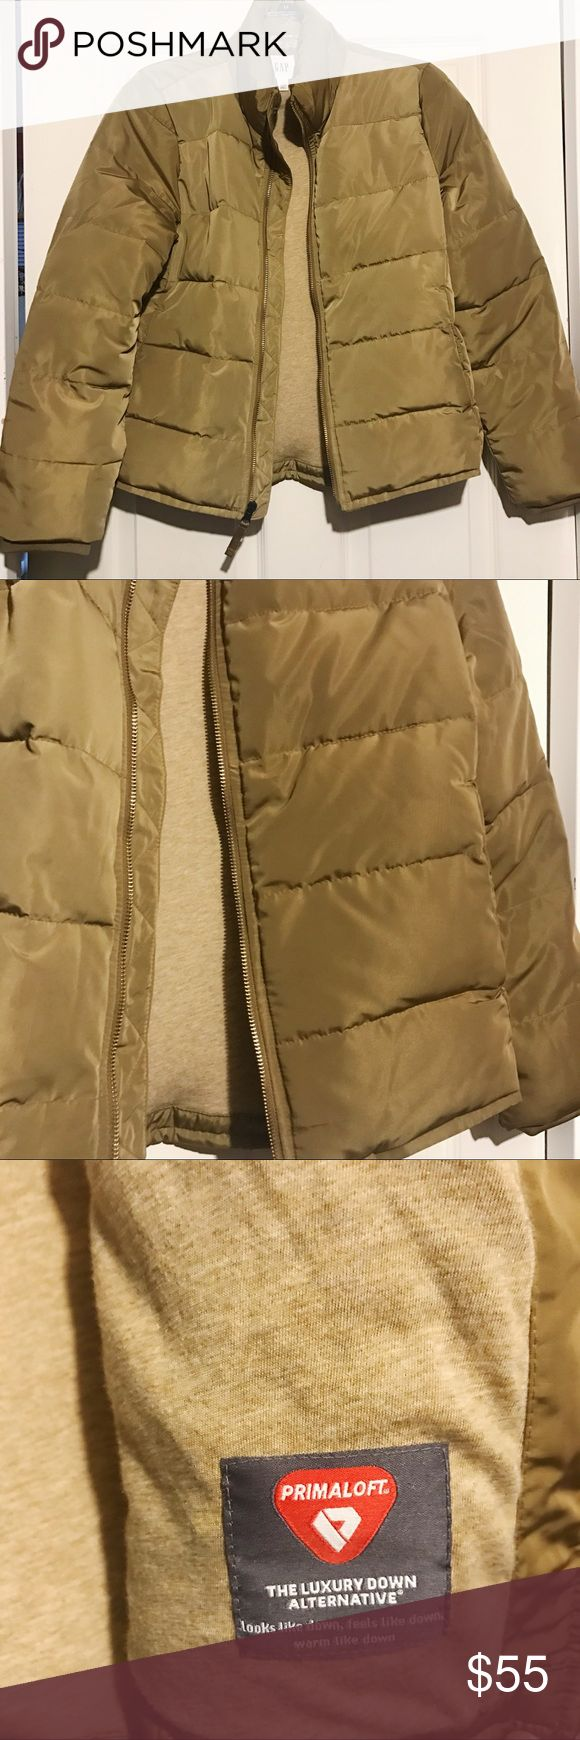 Gap Zip Up Puffer Jacket Tan Sz Small petite Gap / Zip Up Puffer Jacket / color: Tan-camel / with primaloft, a luxury down alternative / Sz Small Petite GAP Jackets & Coats Puffers